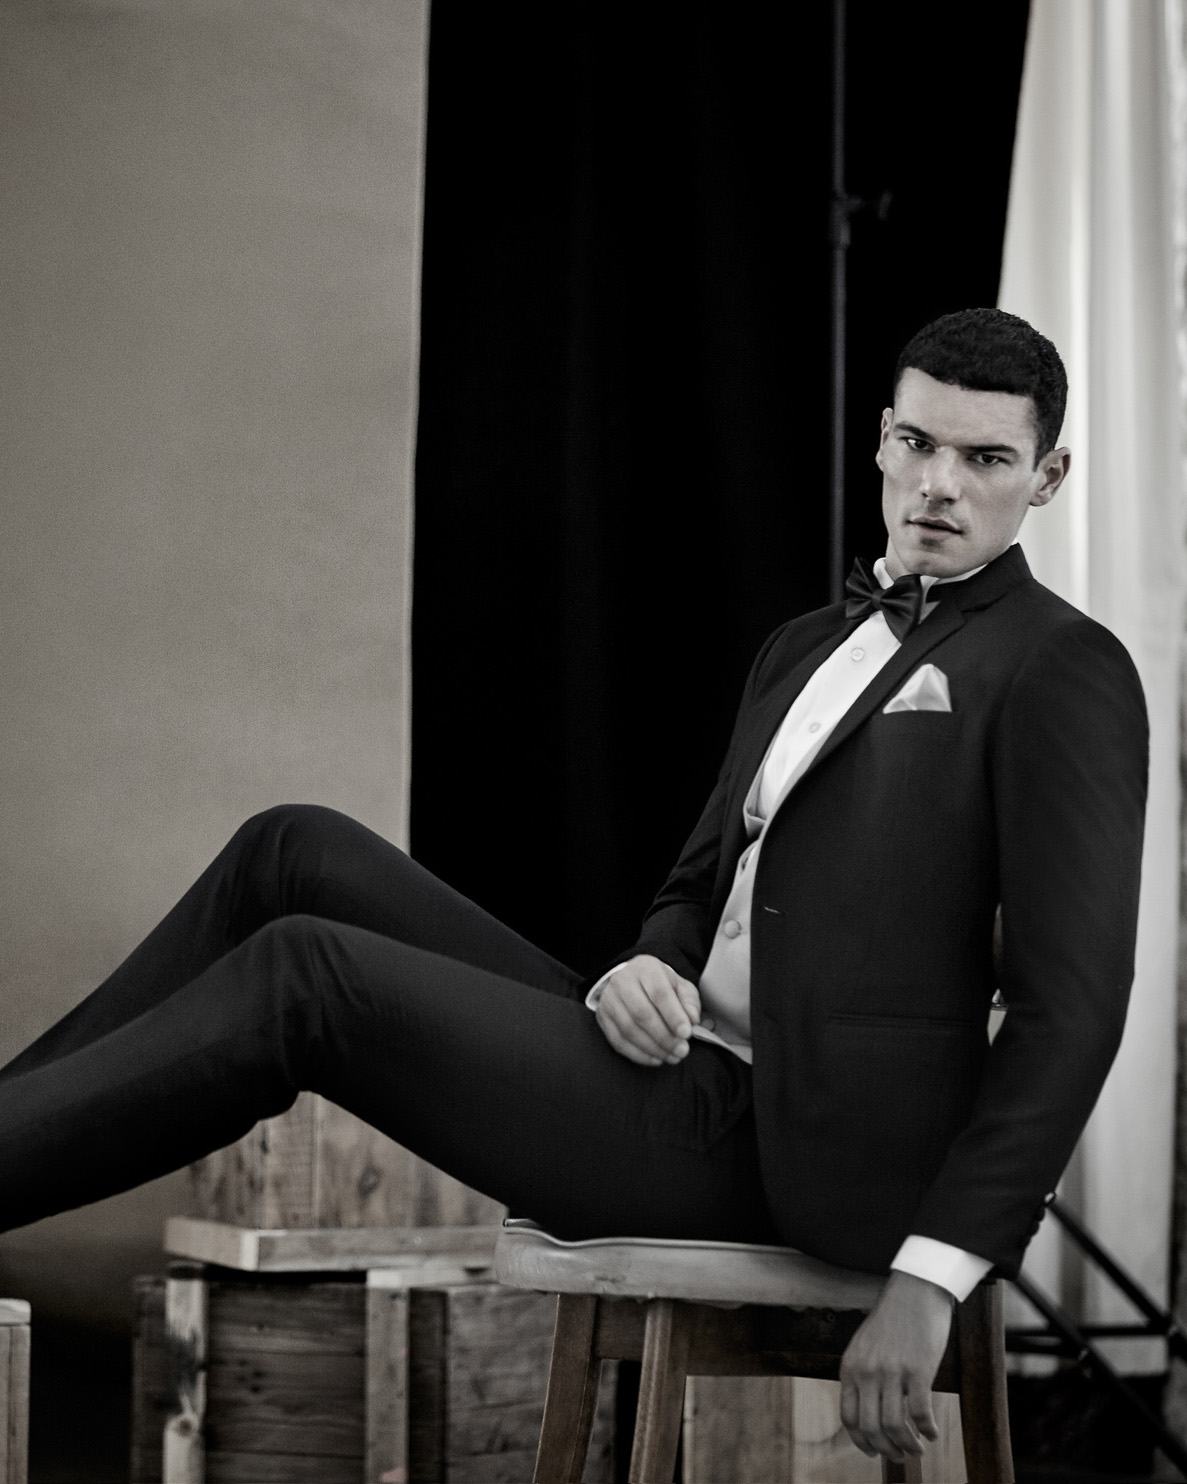 Groom suit - Alex 09